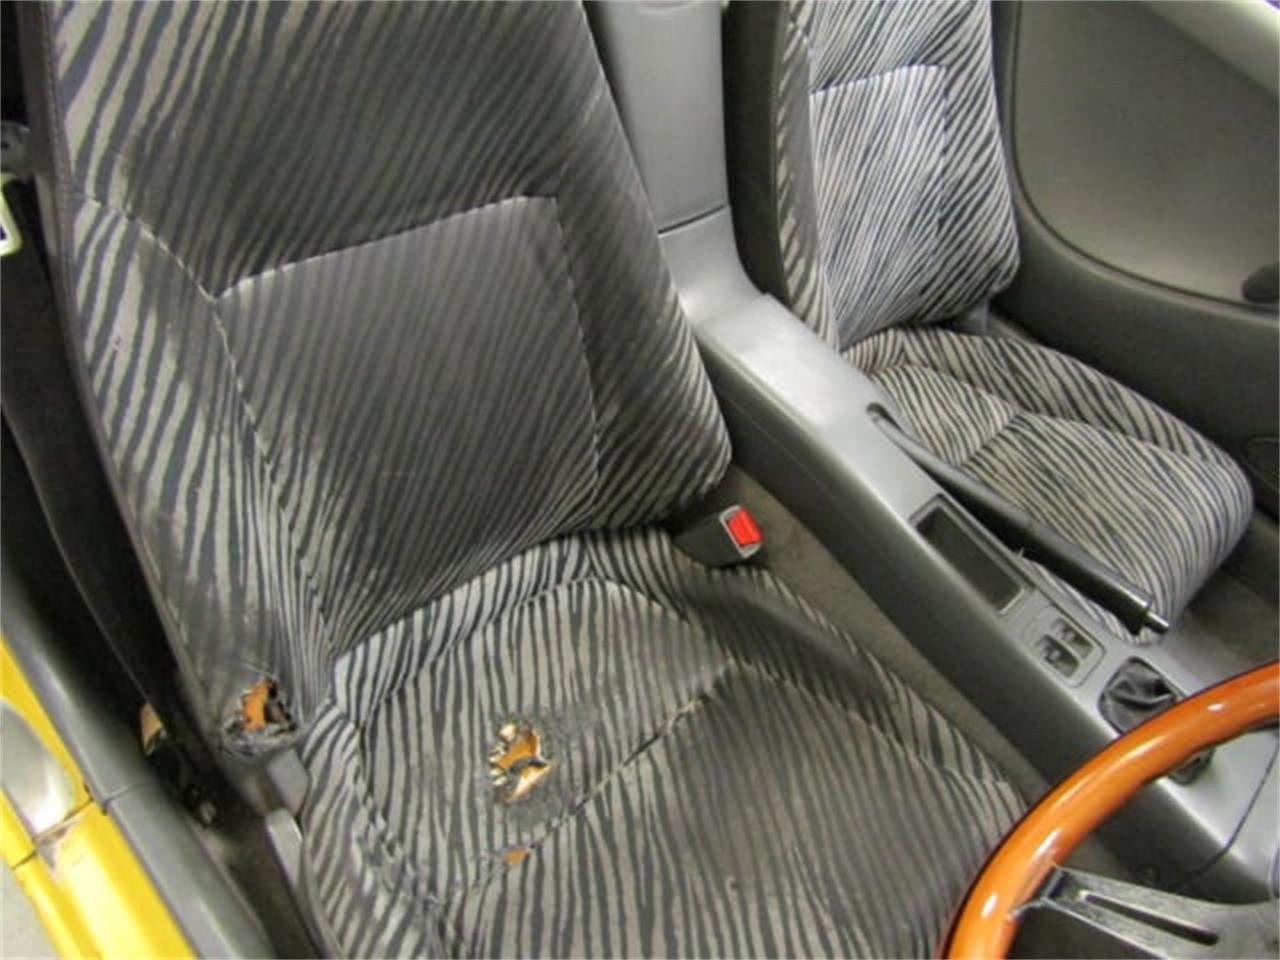 Large Picture of 1991 Honda Beat located in Christiansburg Virginia - $4,990.00 - JL81